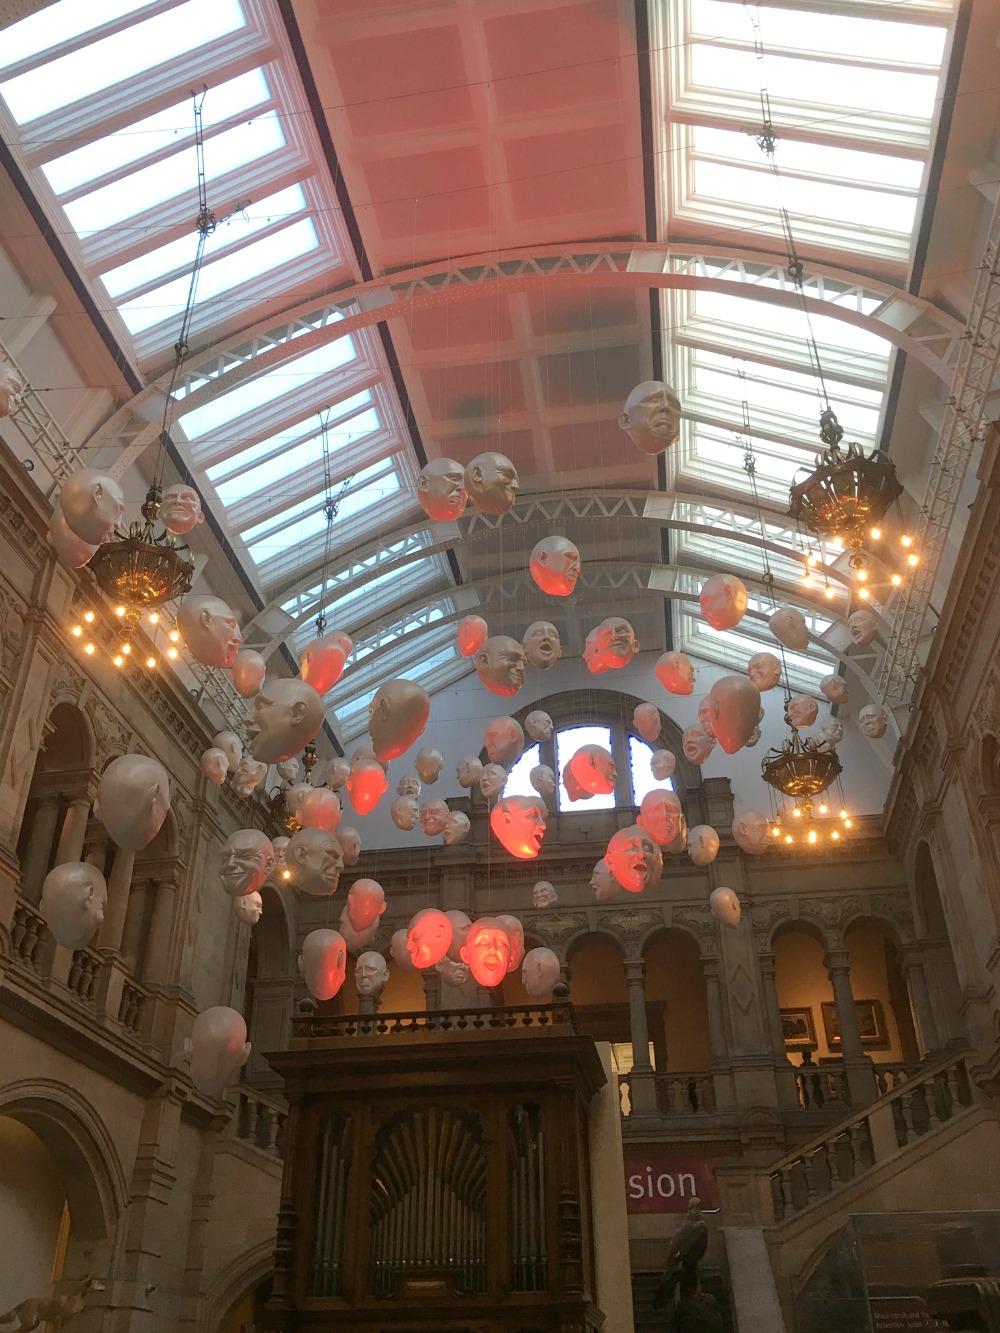 Glasgow - Kelvingrove Museum, hanging heads